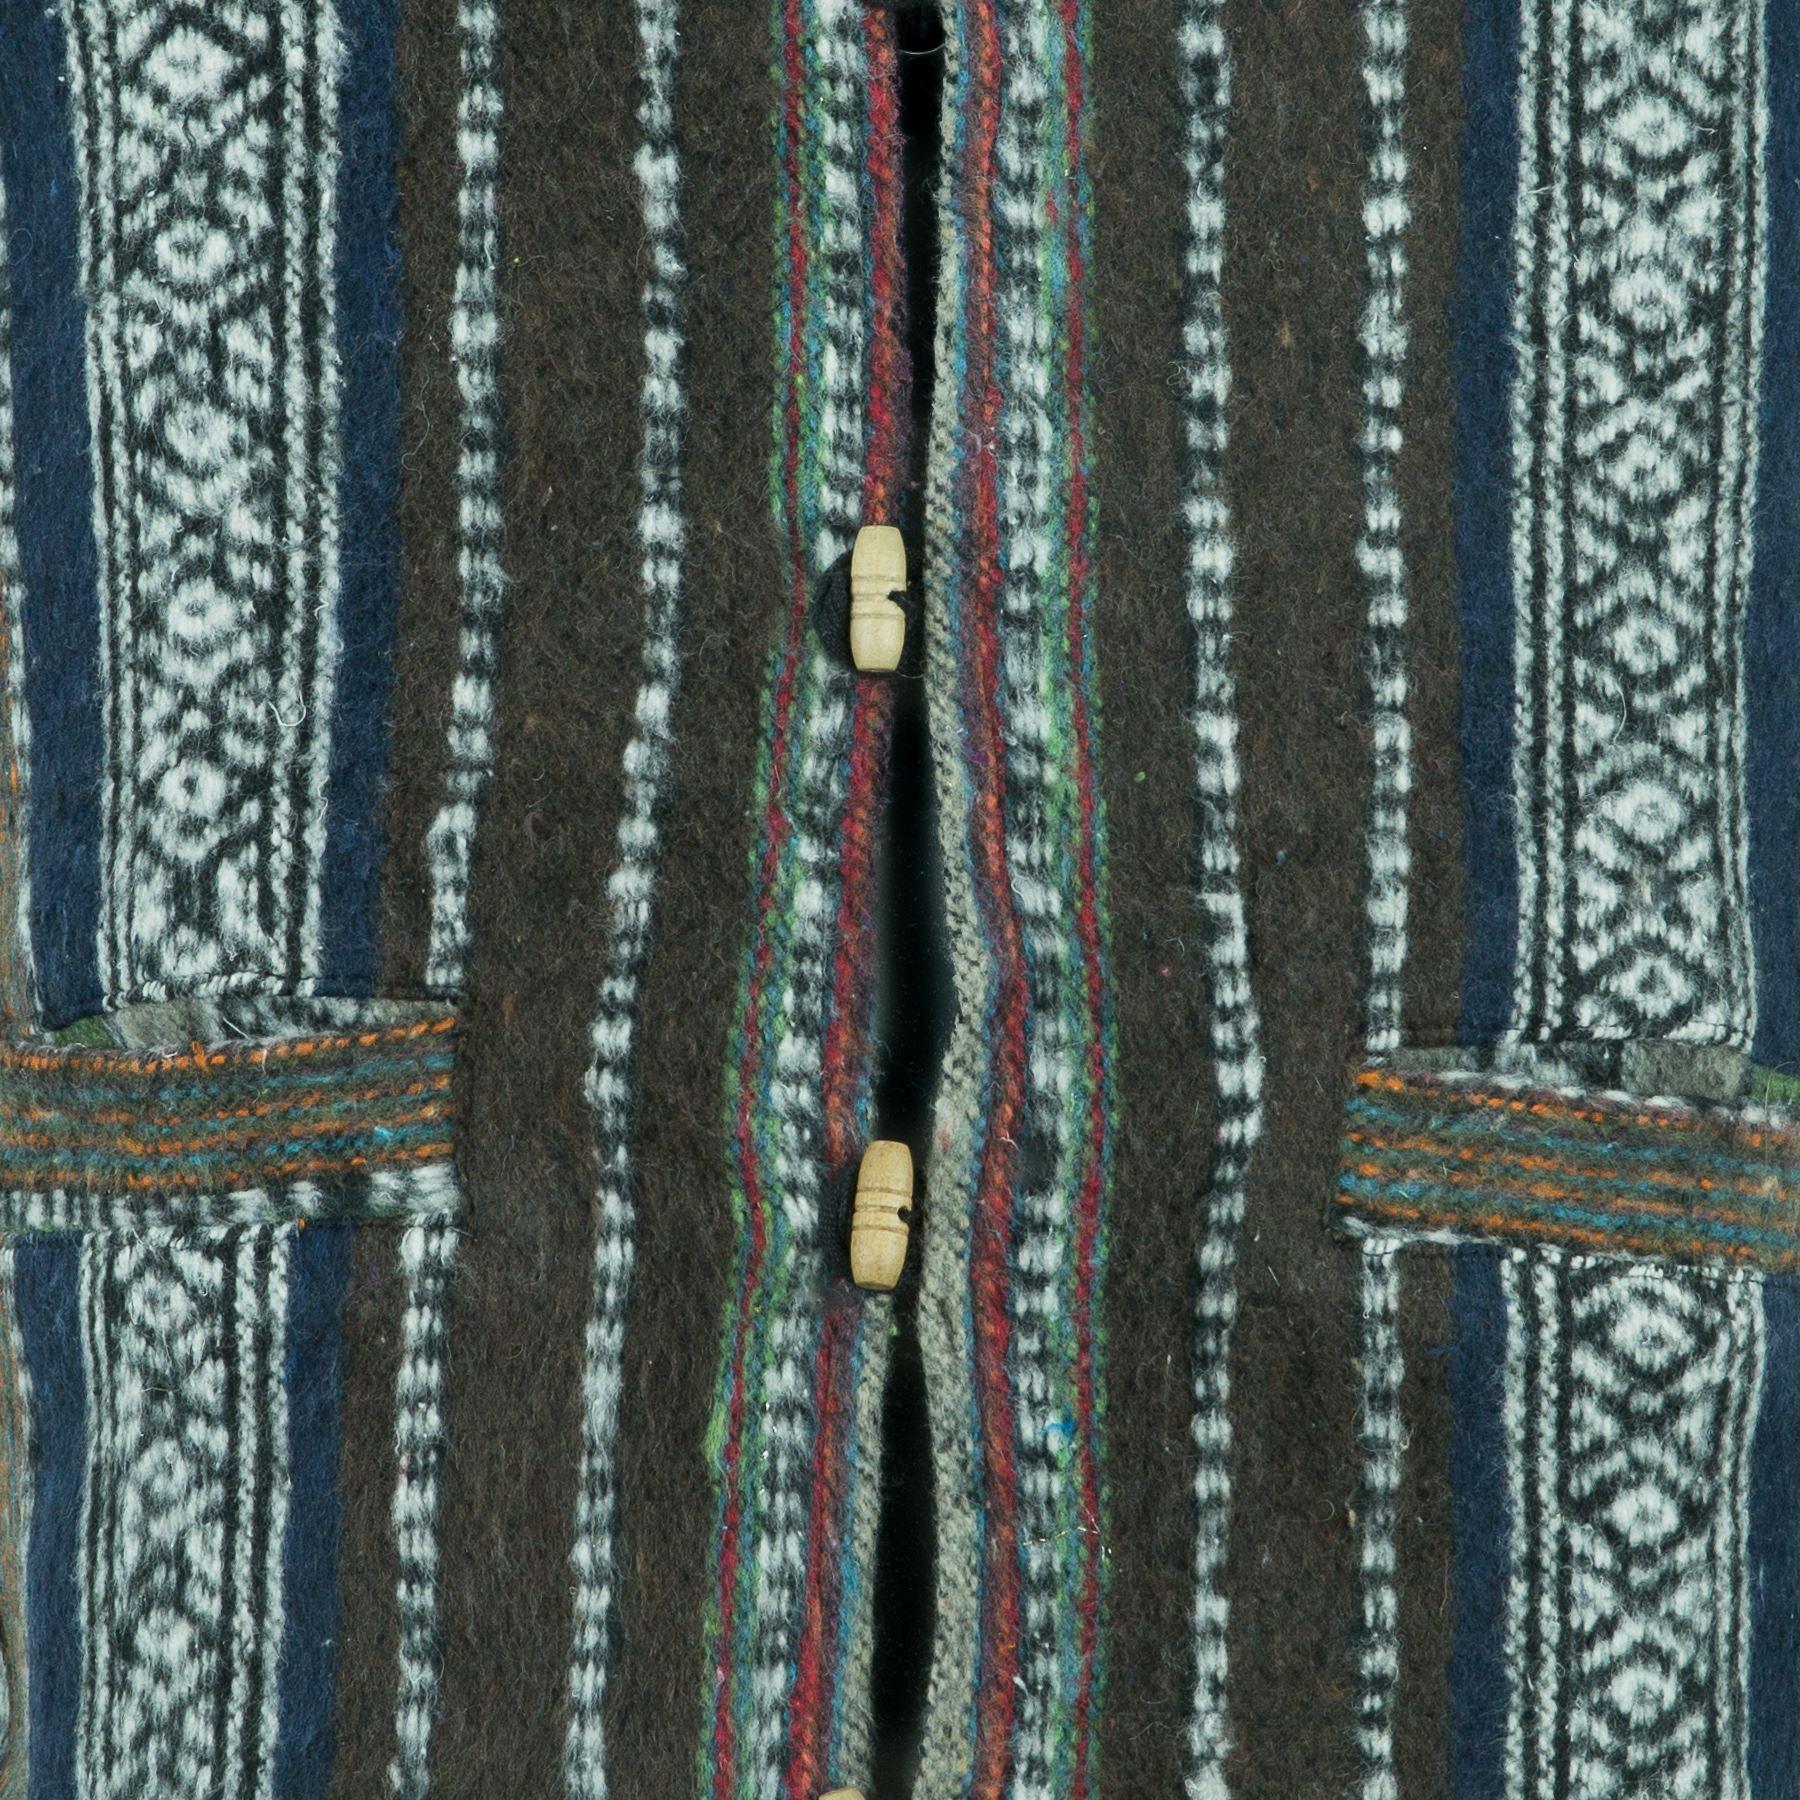 Chaleco-Algodon-Hombre-Perchado-Hippie-Boho-Traje-para-Hombre-Mujer miniatura 10